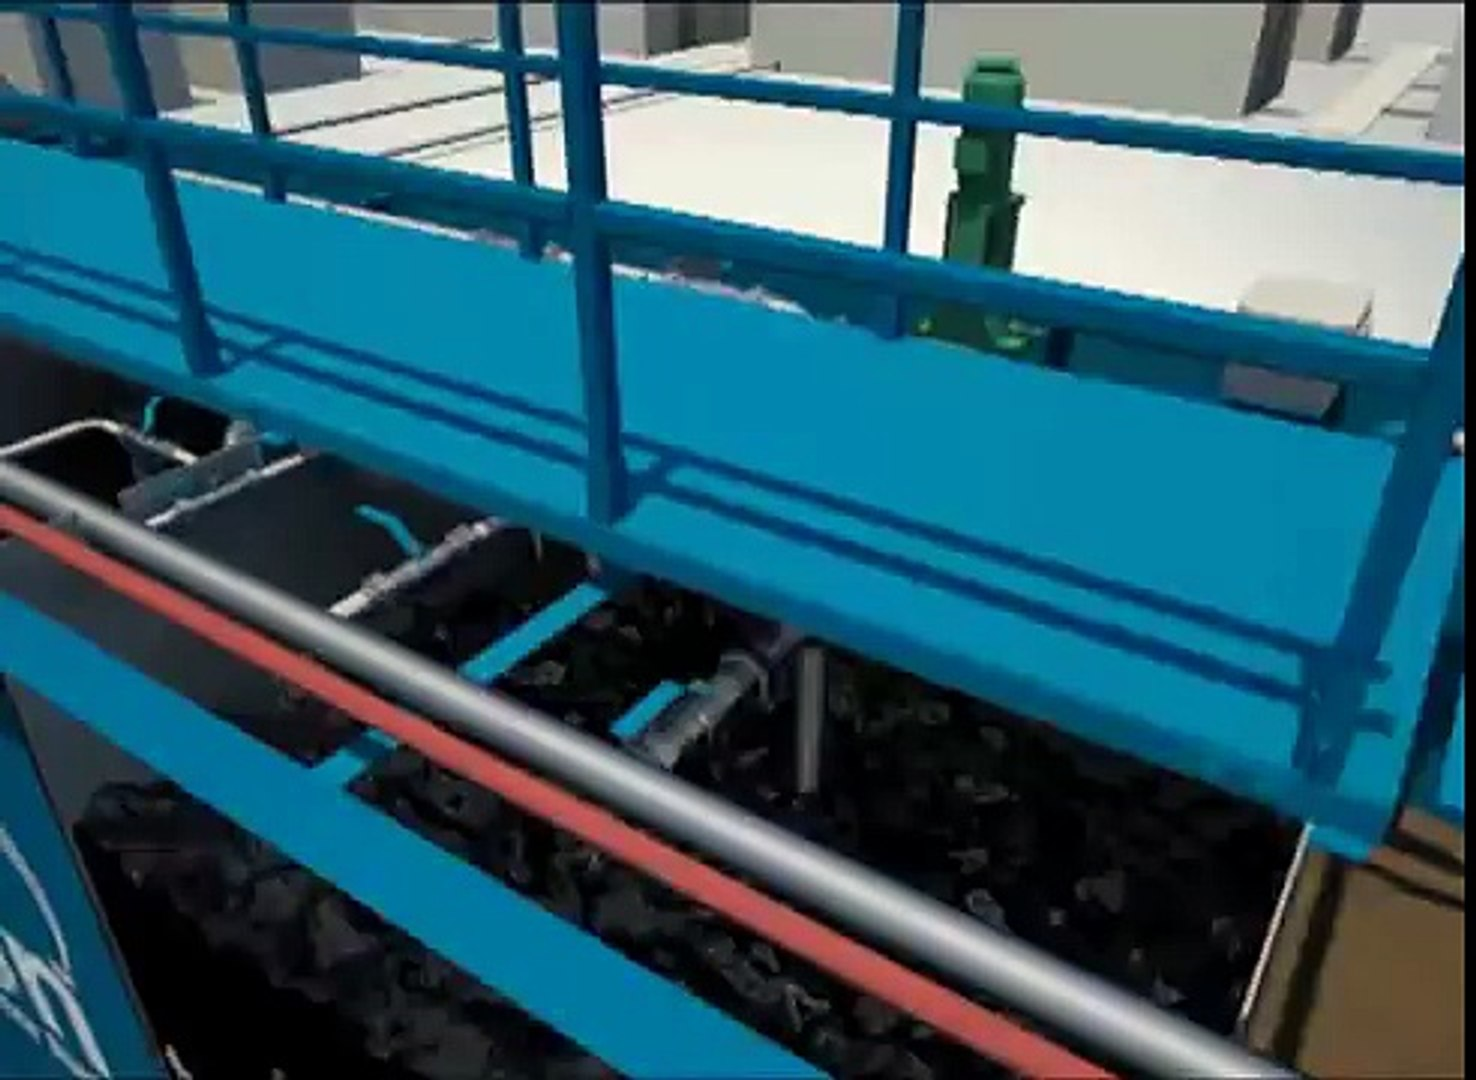 Mixed Bed Bio Reactor